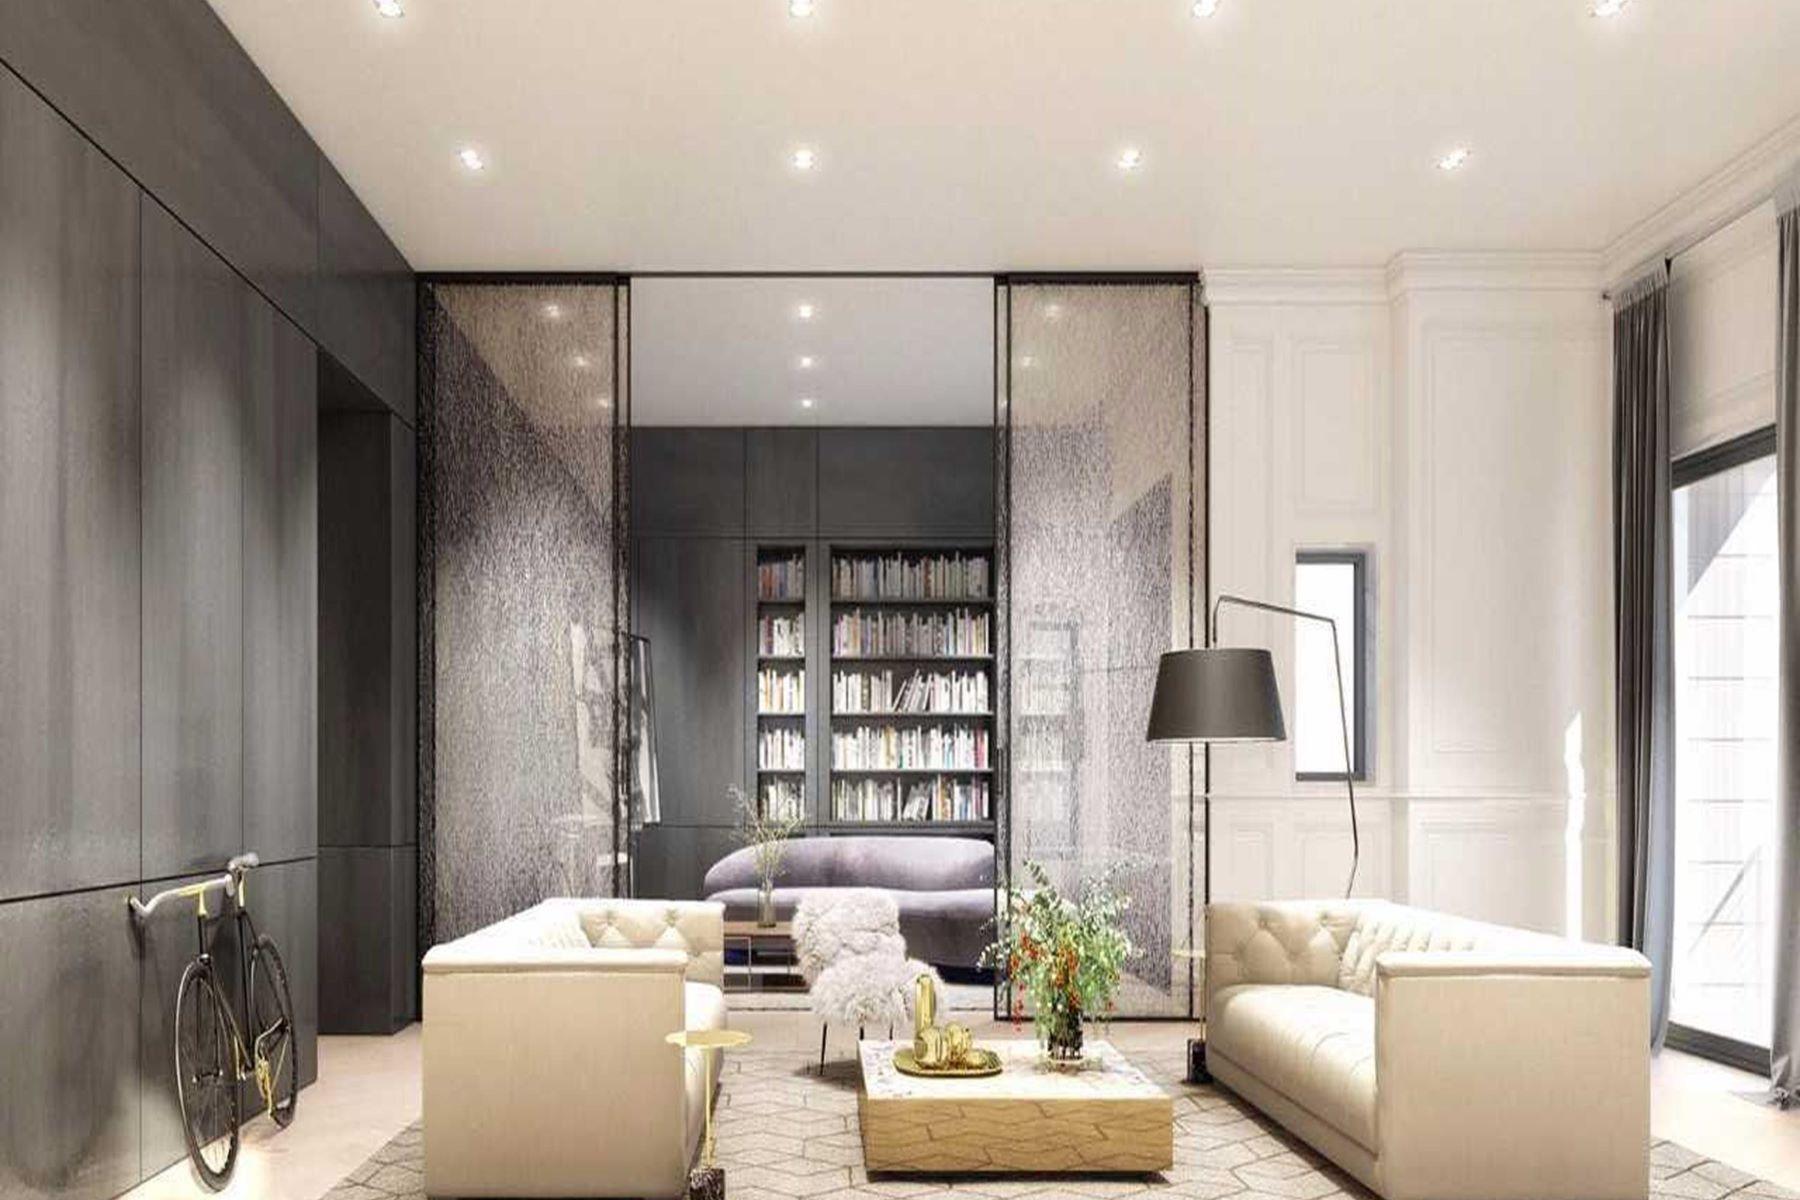 Condominiums للـ Sale في 1436 W. 31st Street PH 500 3041 Holmes Ave S PH 500, Minneapolis, Minnesota 55408 United States